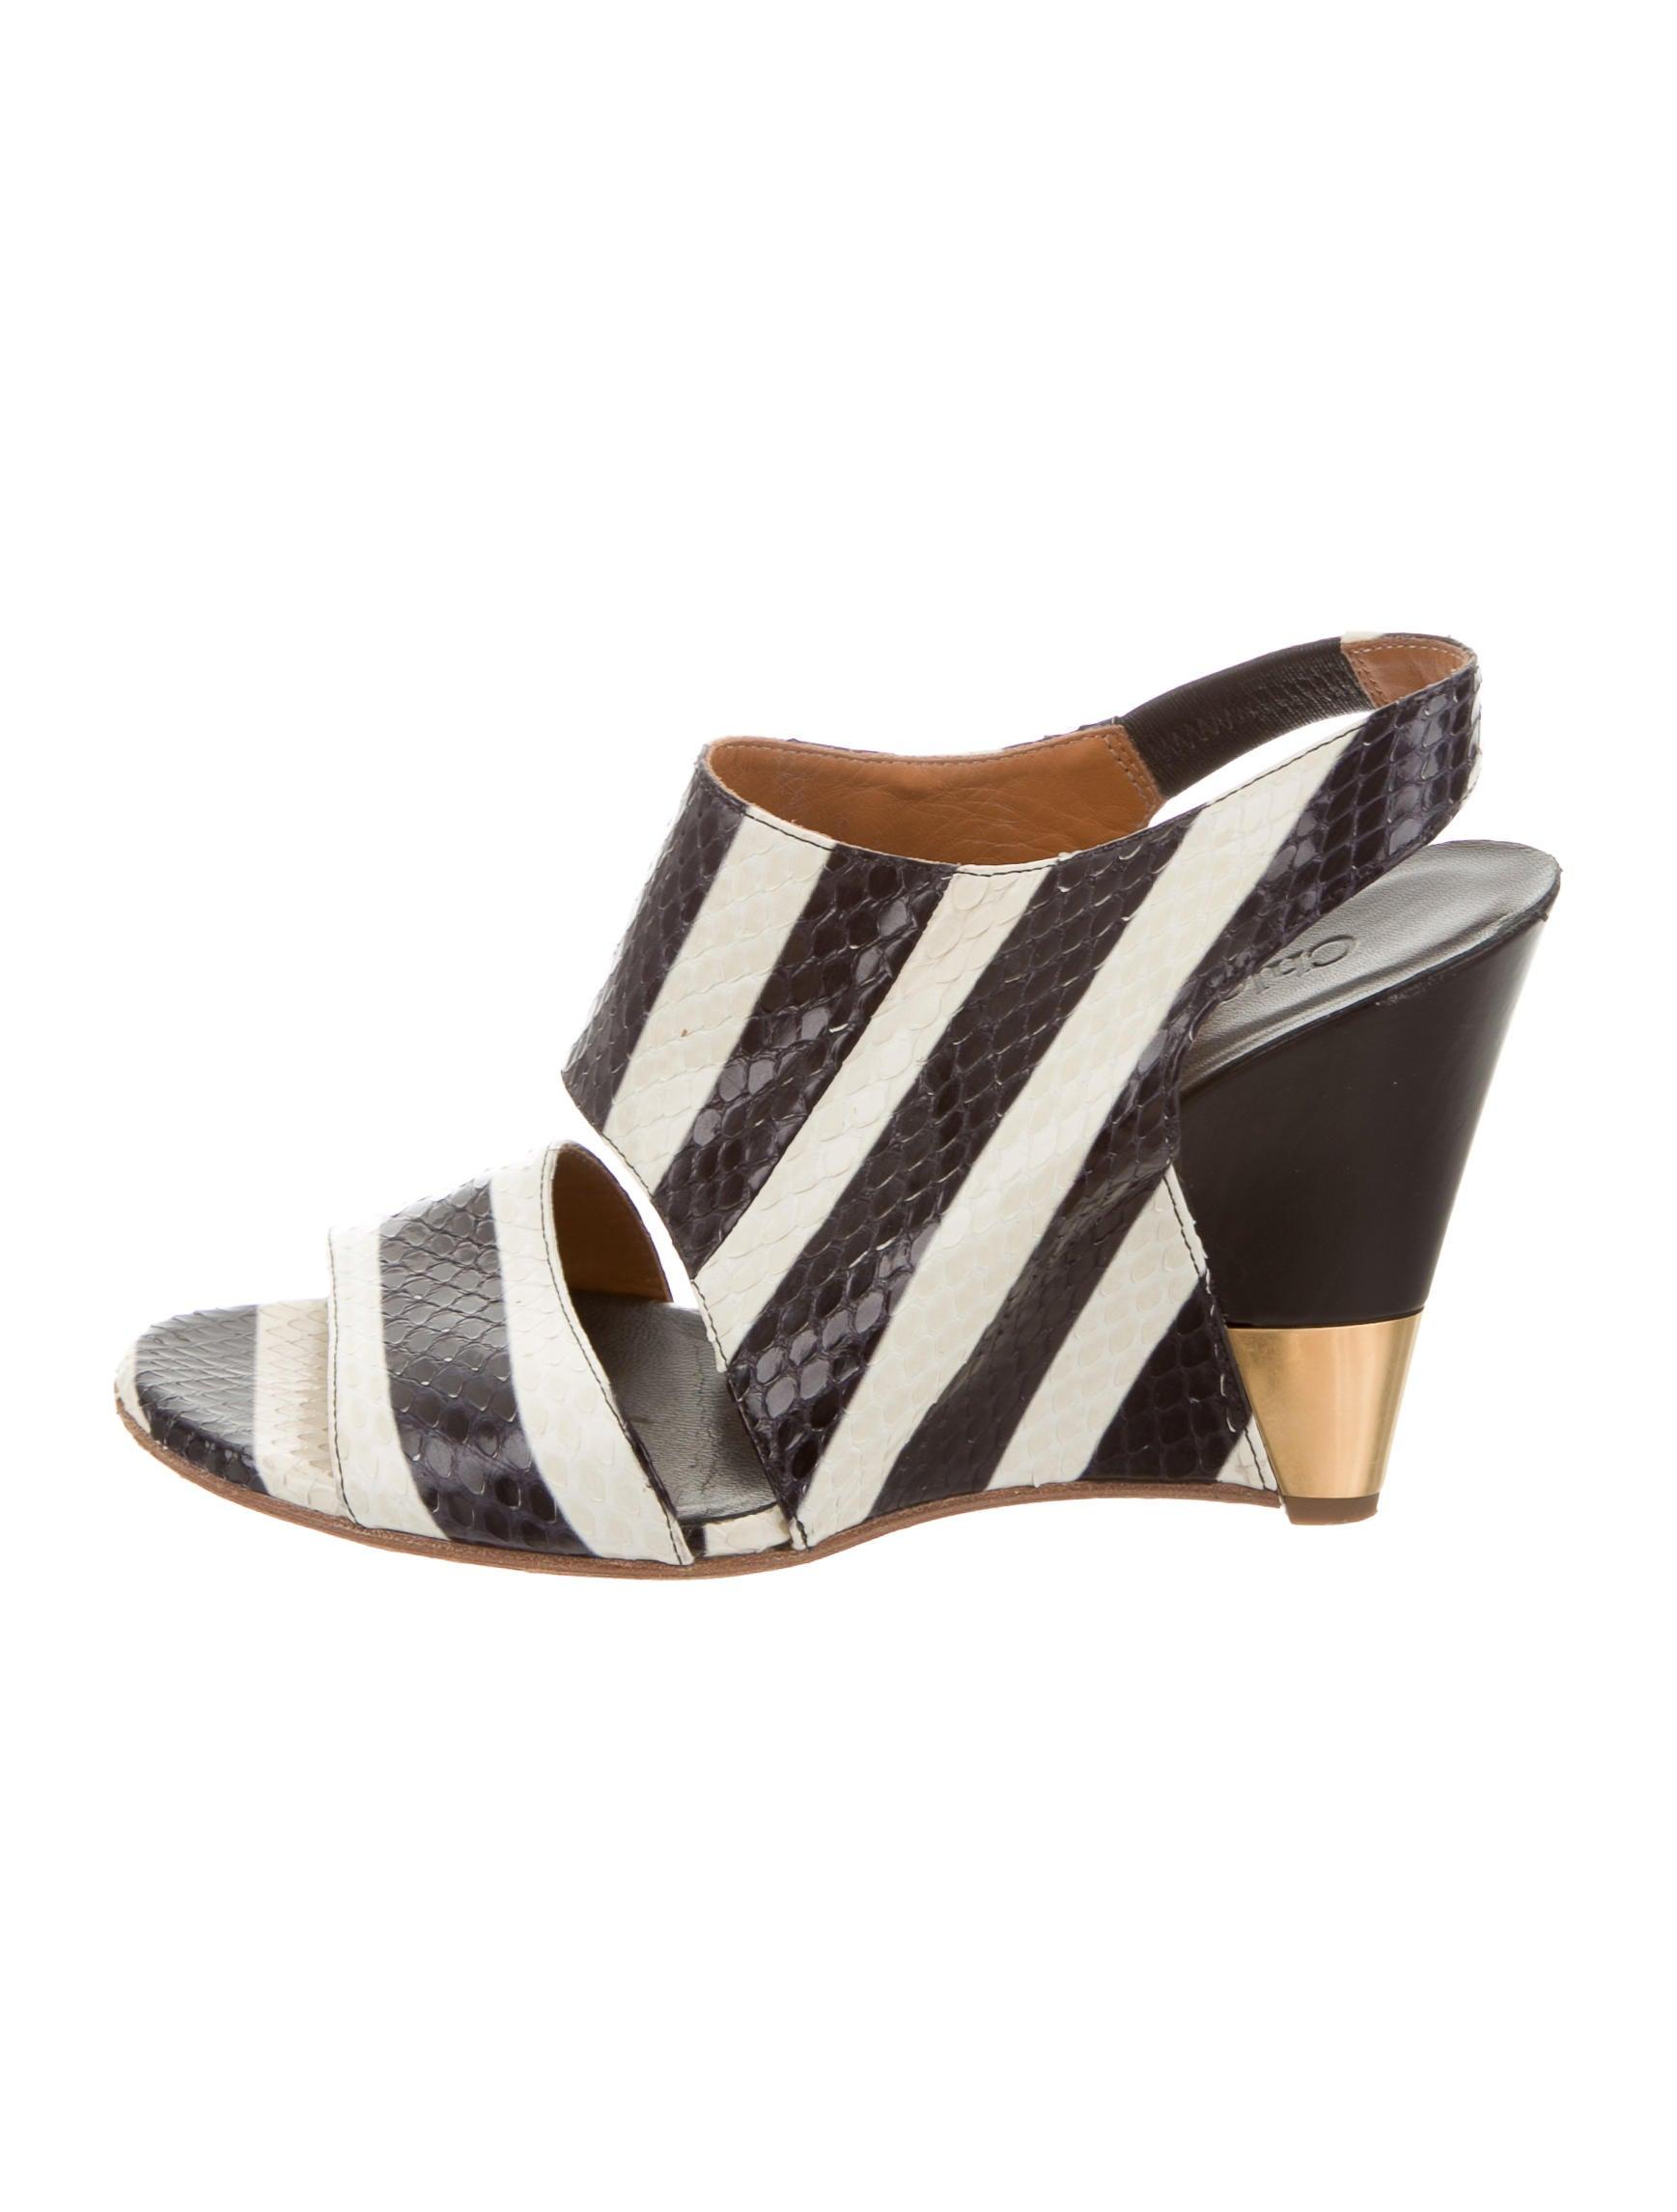 Chloé Python Slingback Sandals free shipping in China buy cheap sale QT0nZe